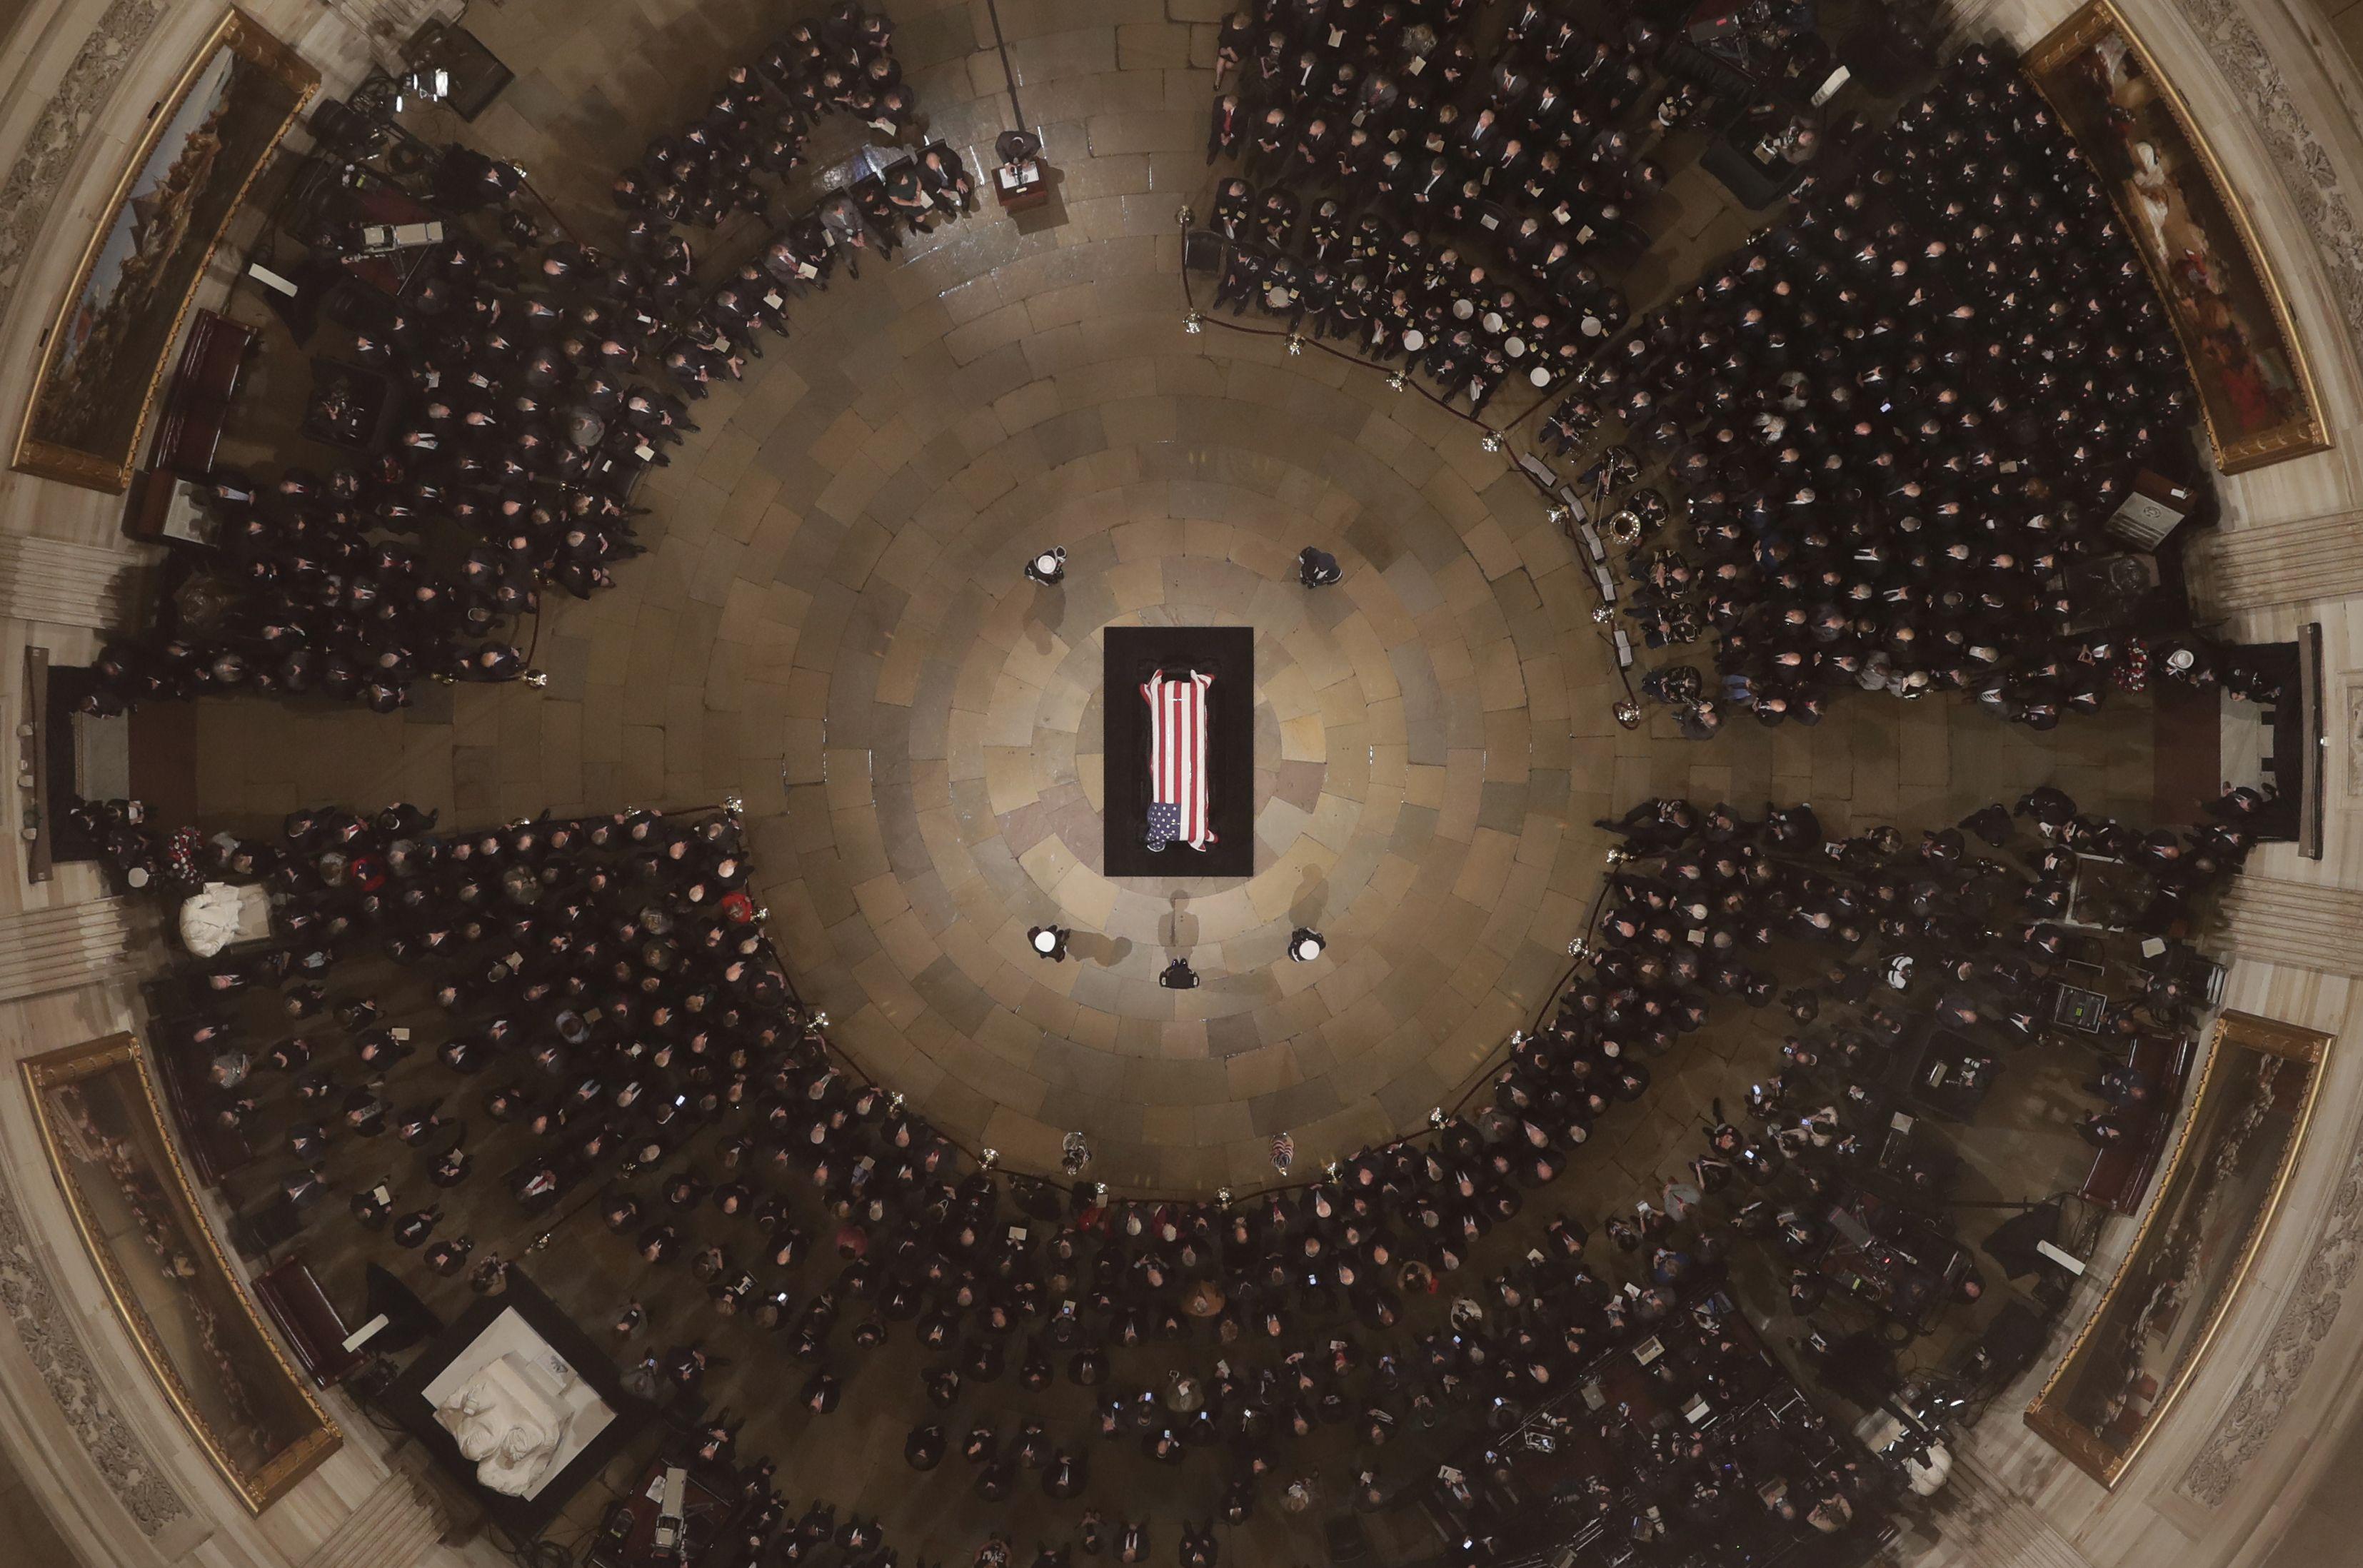 George H. W. Bush's casket in the rotunda.